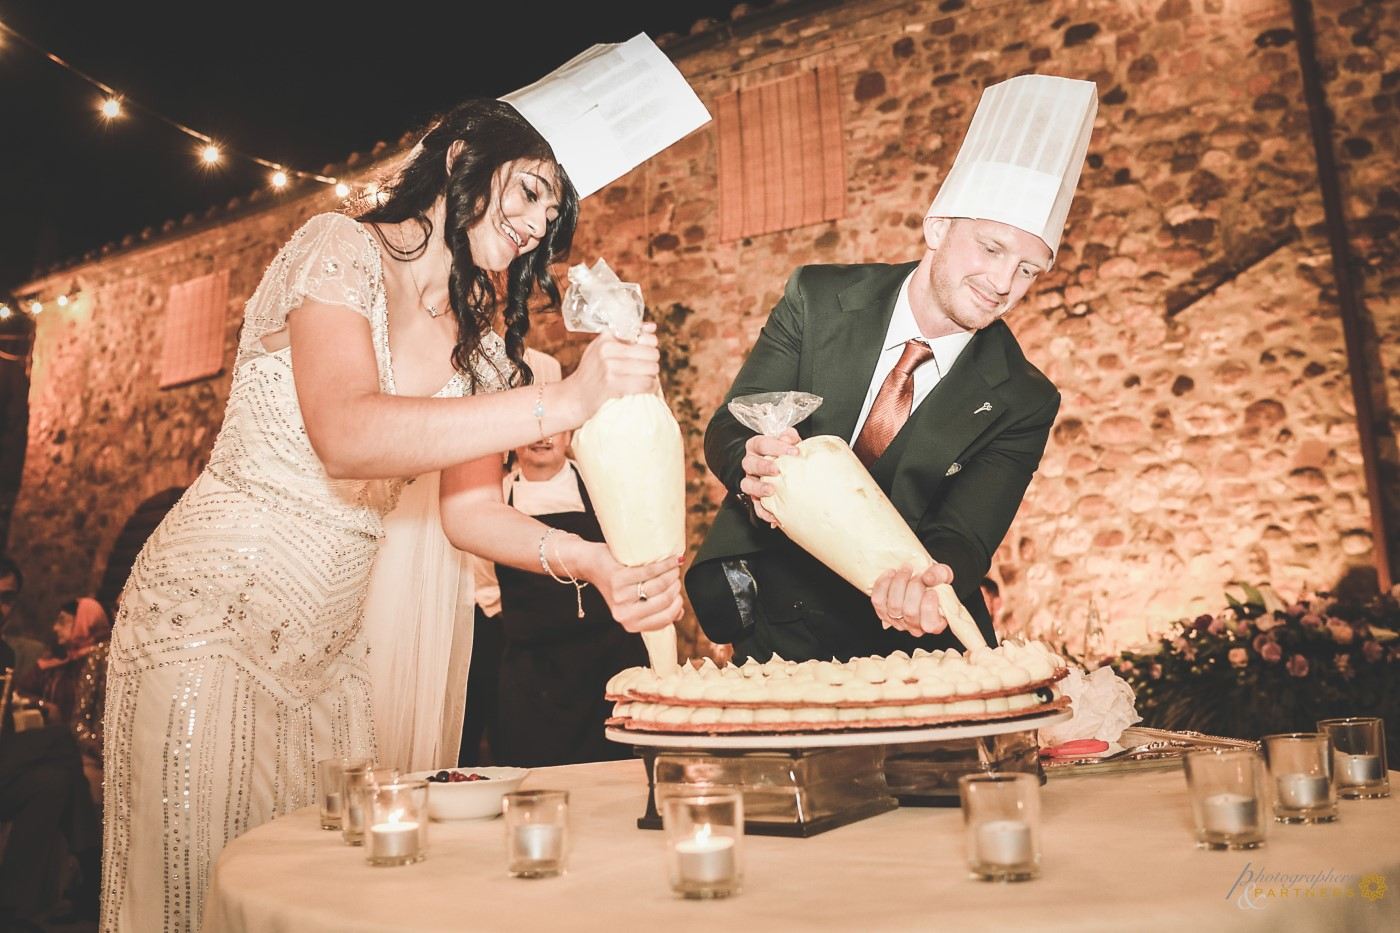 Wedding cake under construction.